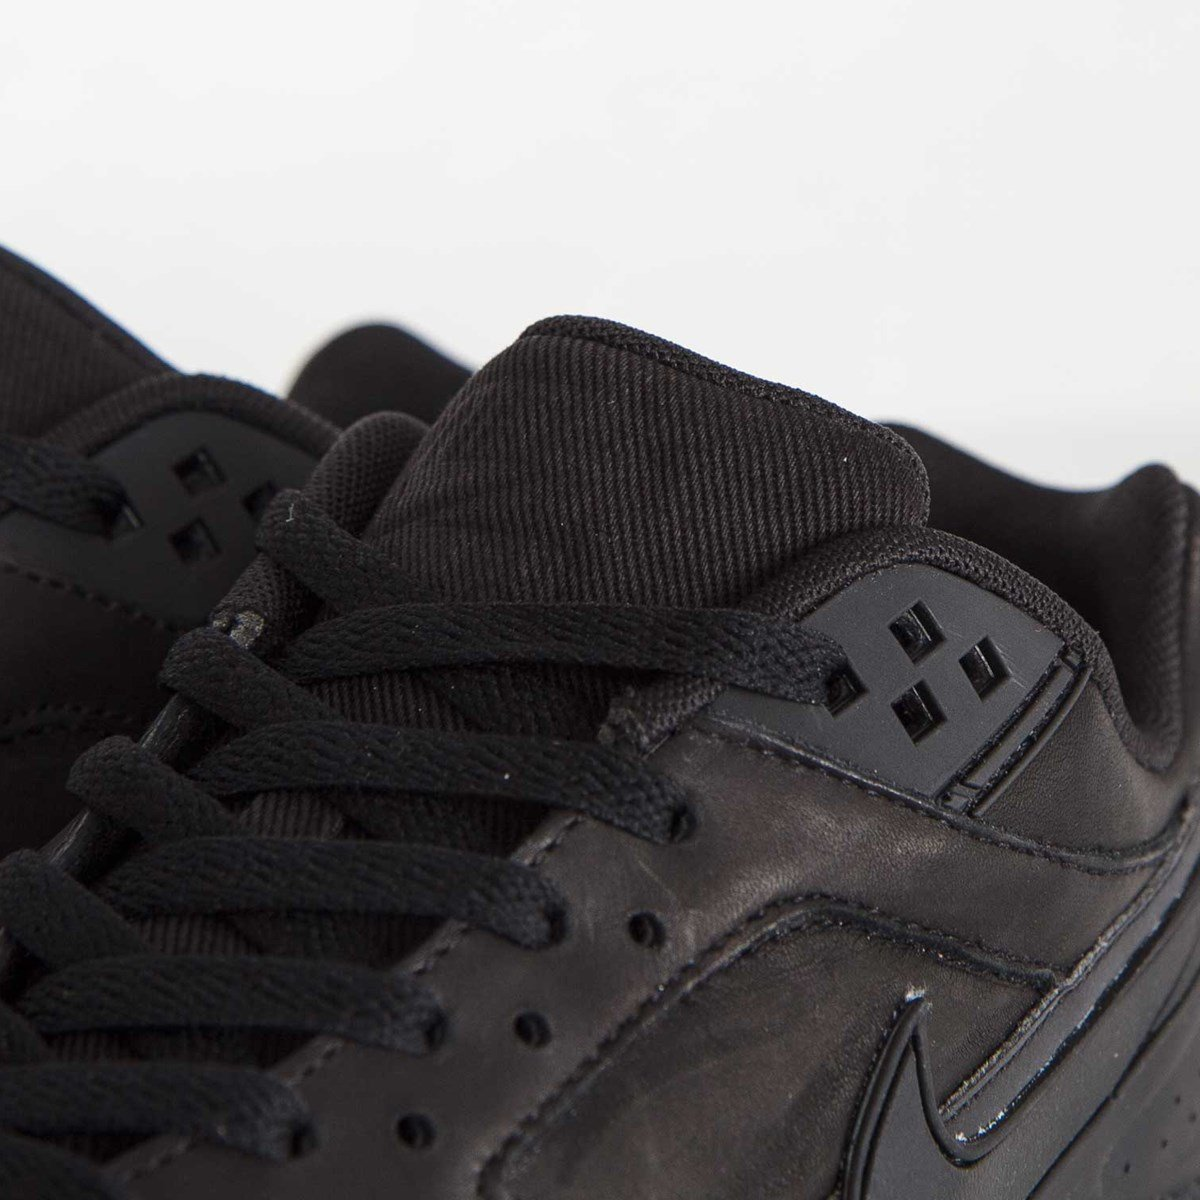 b5b6596fb7f Nike Air Max BW Premium - 819523-006 - Sneakersnstuff | sneakers &  streetwear online since 1999